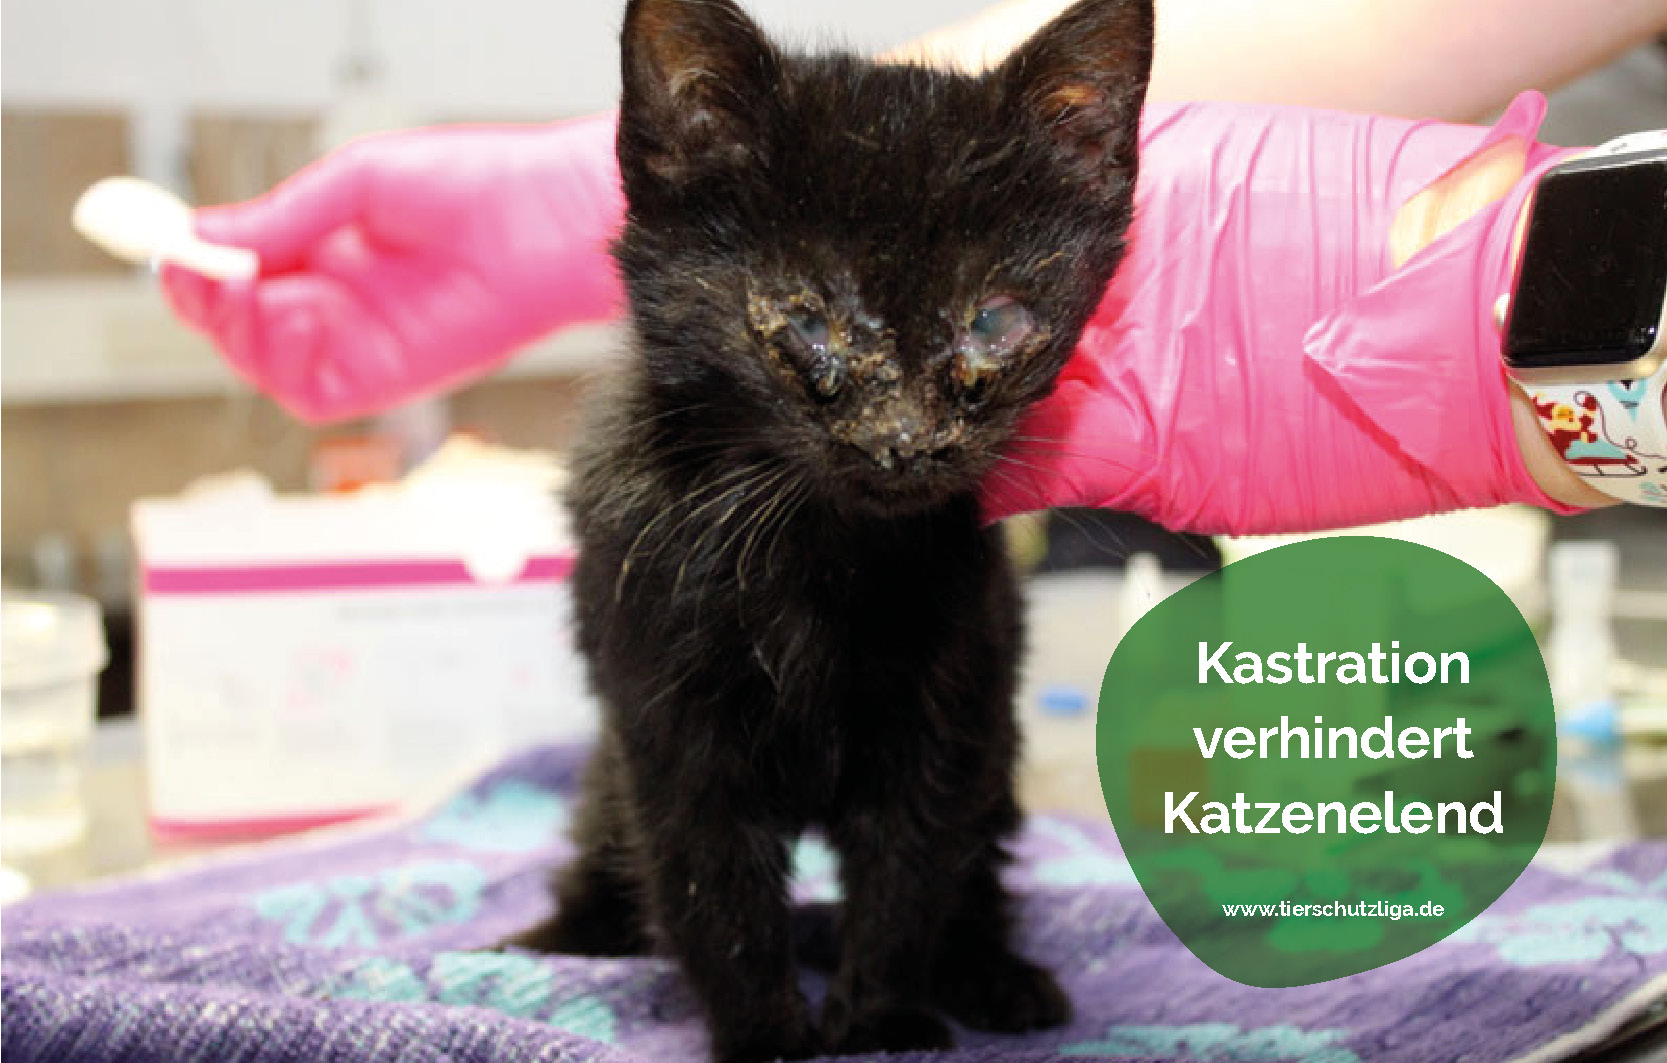 Standart-Beitrag-katzenelend Aktuelles - Tierschutzliga Dorf